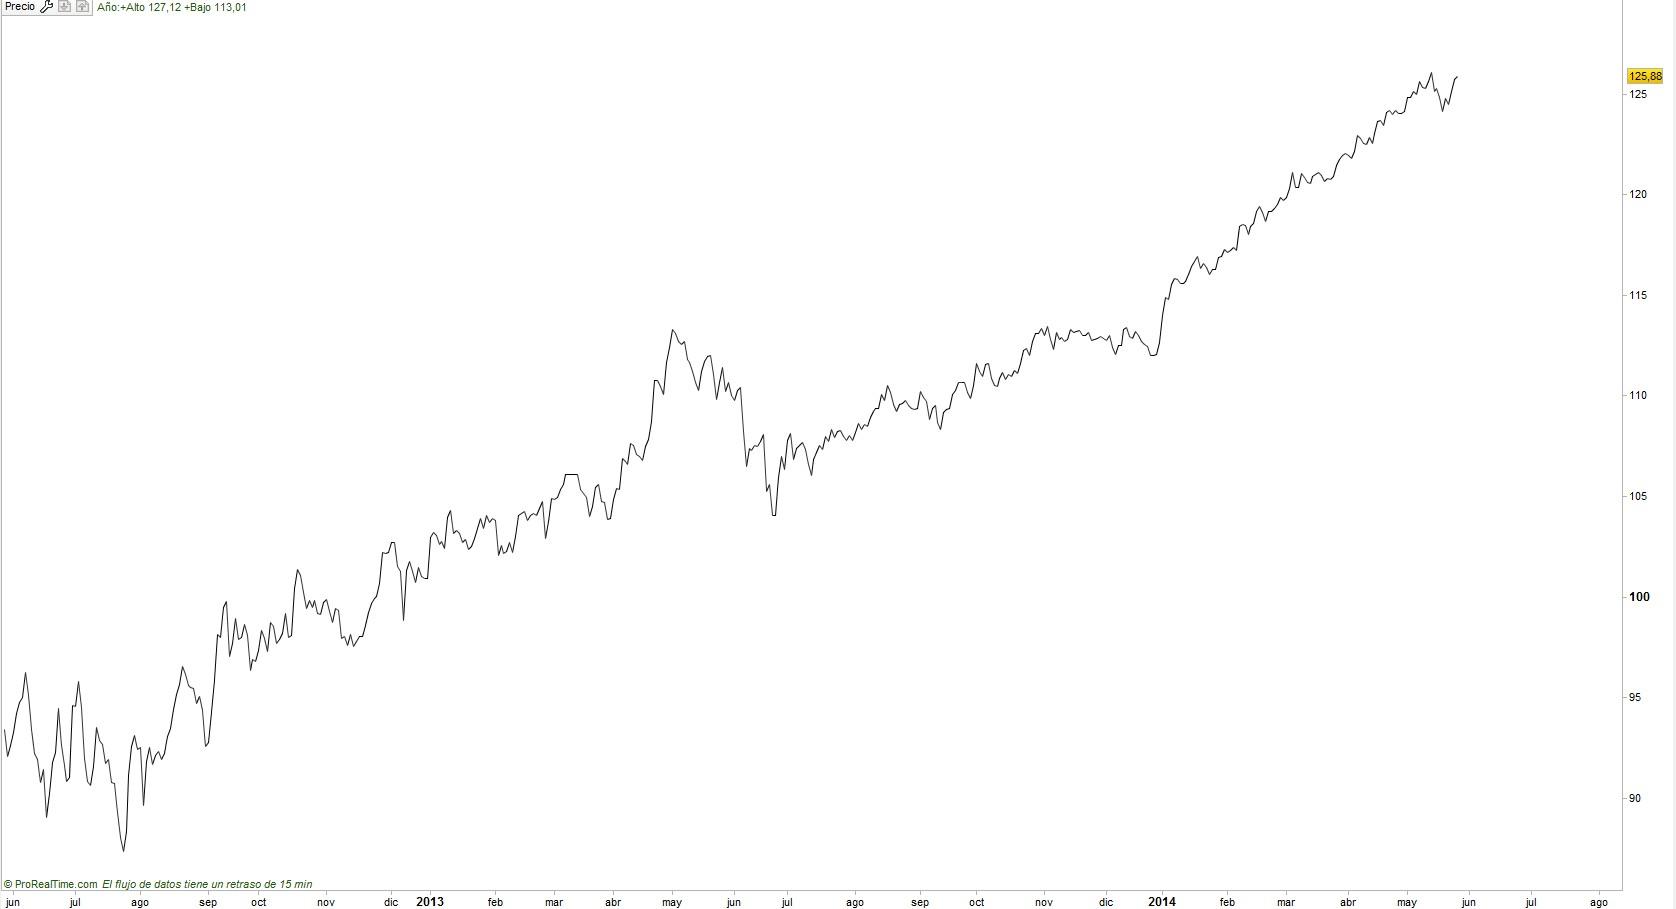 Futuro bono españa 10 años